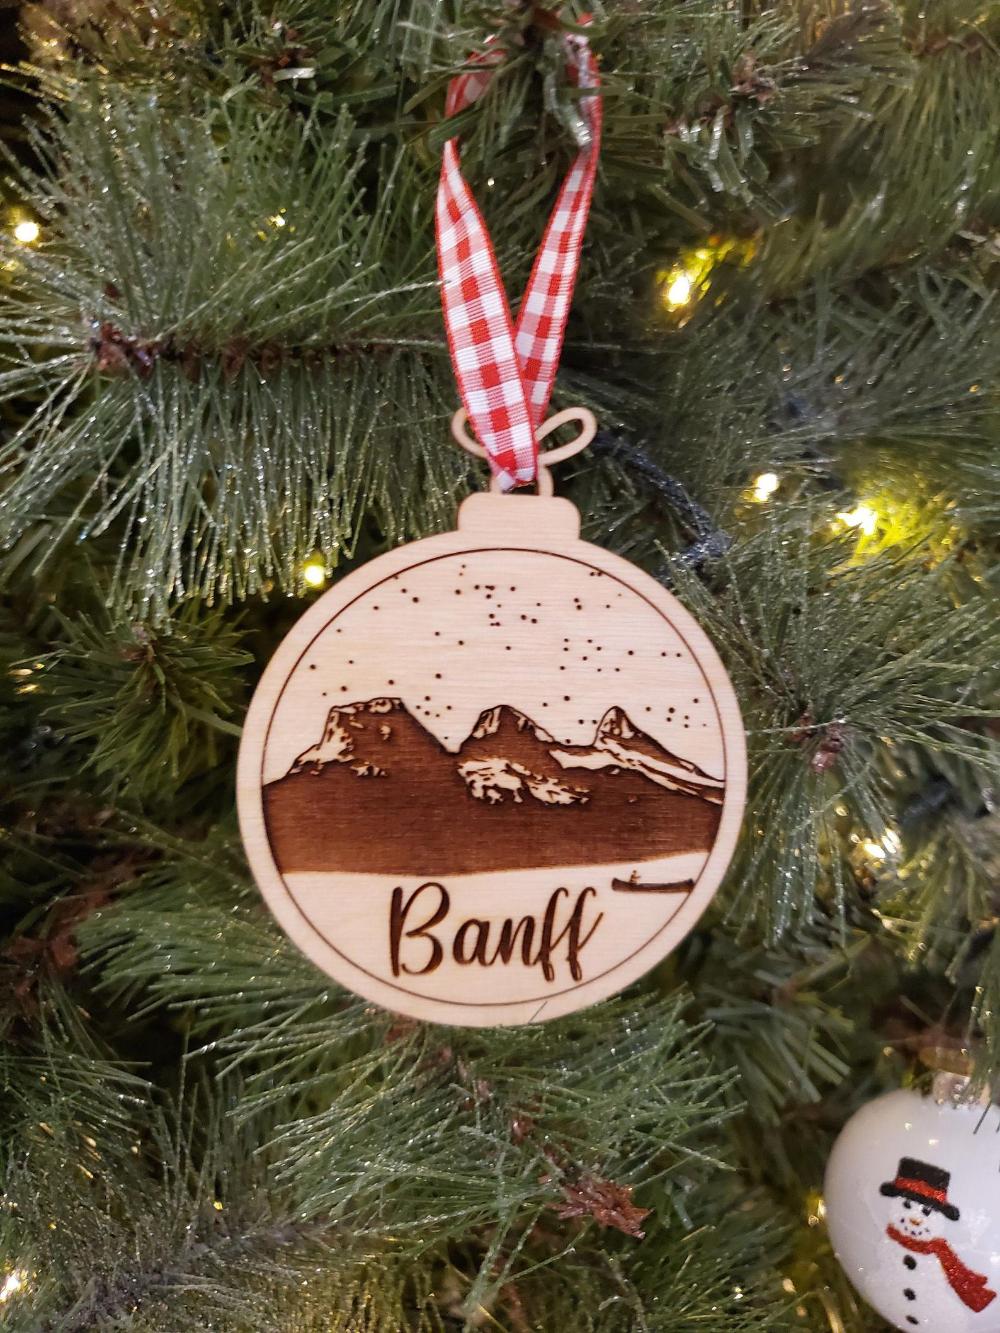 Banff Christmas Ornament Laser Engraved Christmas